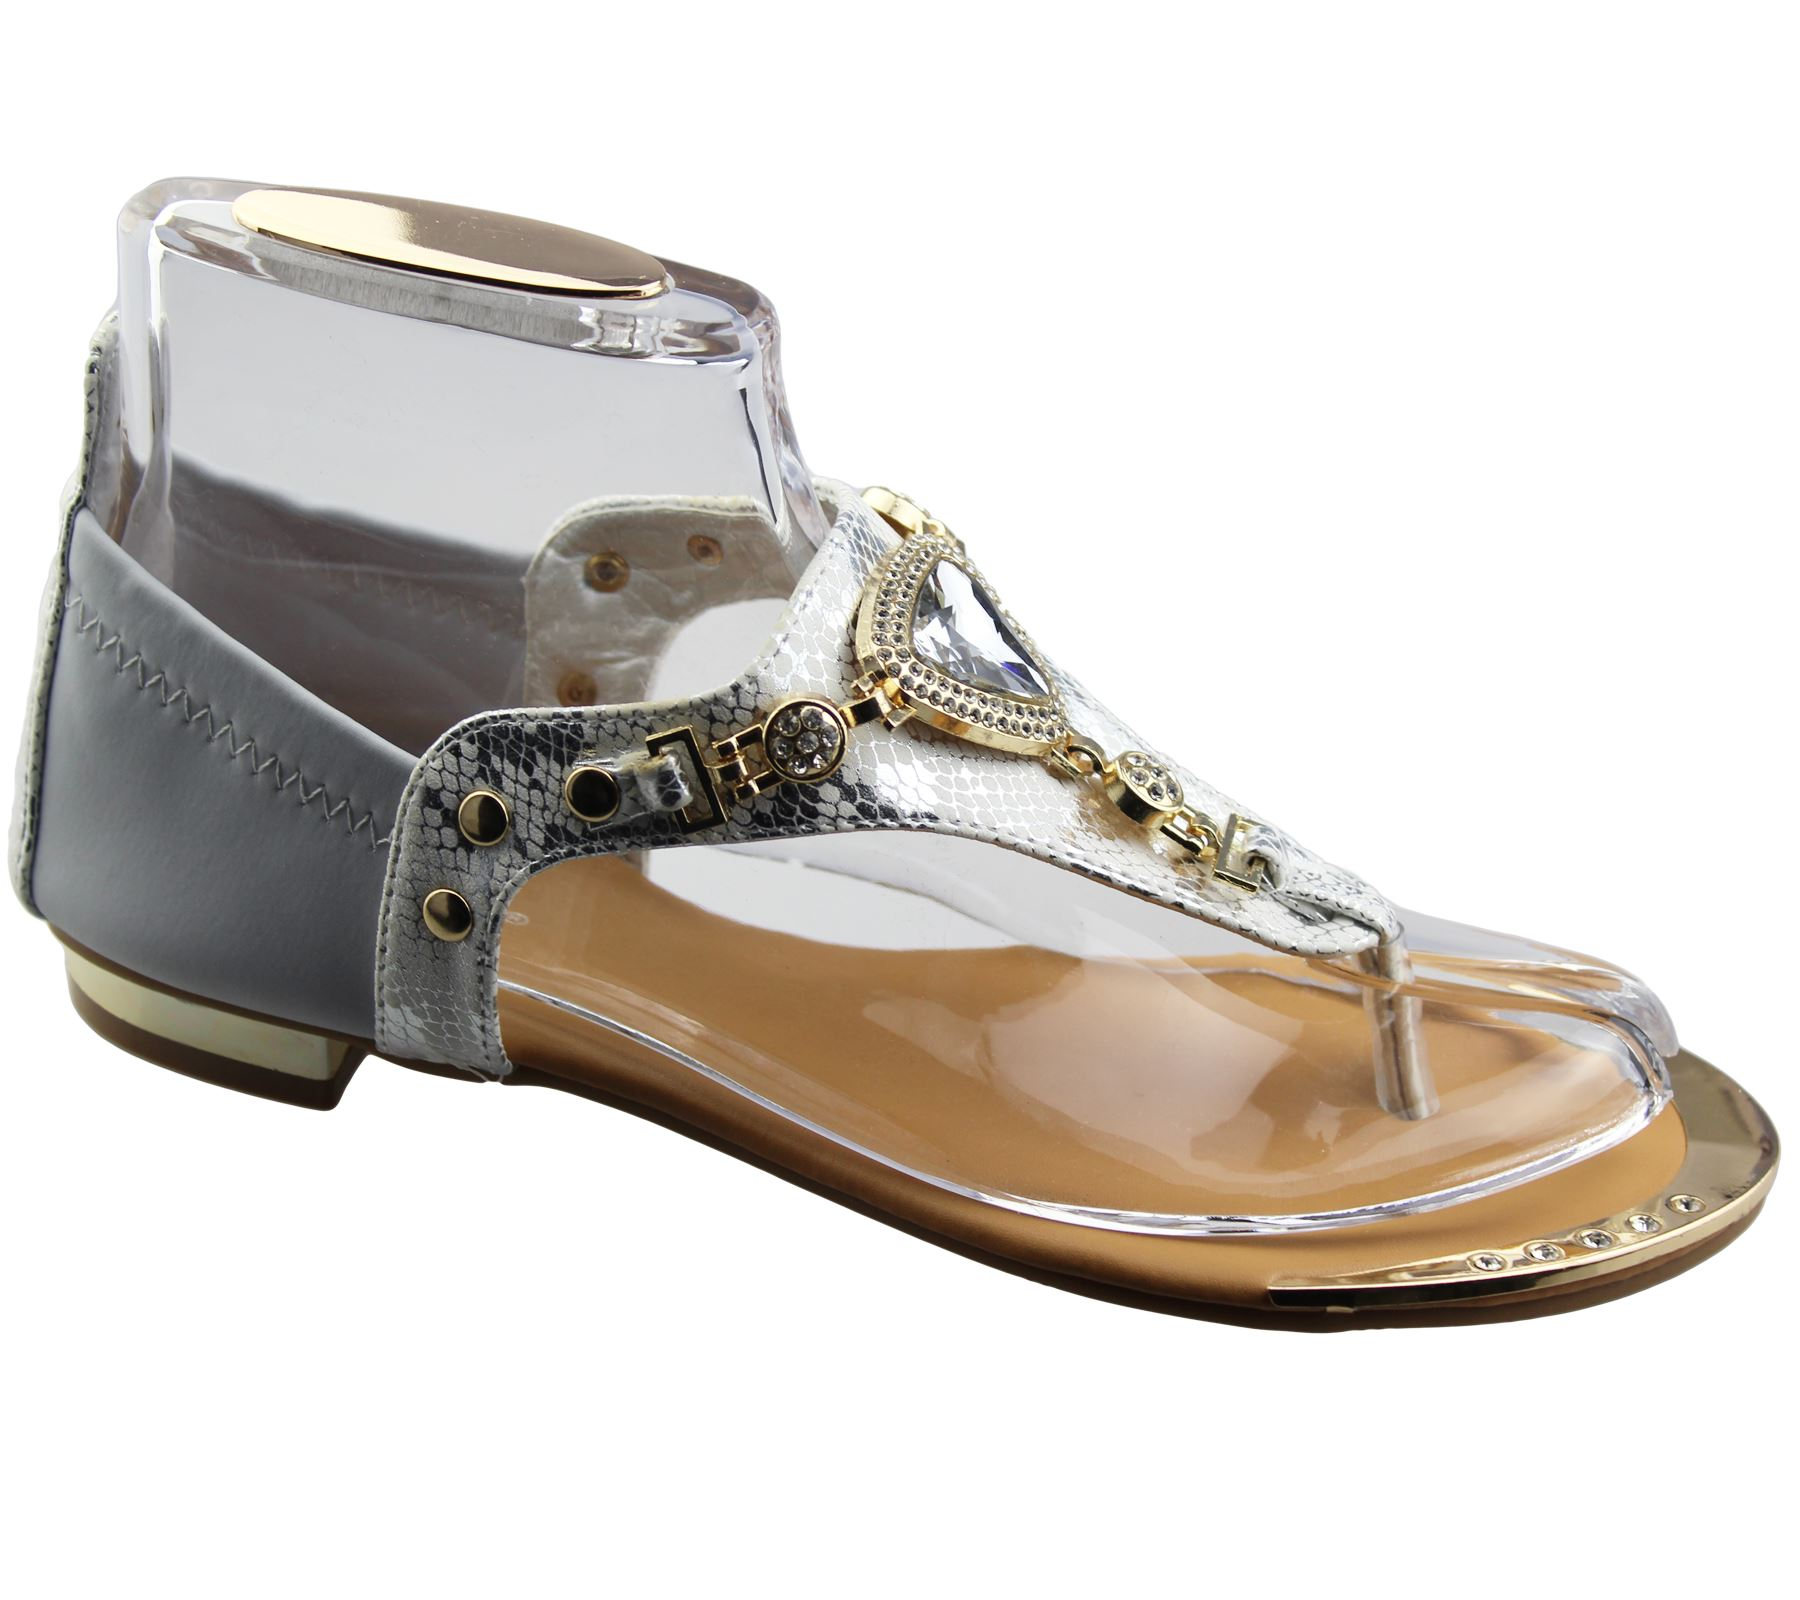 Womens-Flat-Summer-Sandals-Ladies-Diamante-Wedding-Toe-Post-Casual-Slipper thumbnail 12